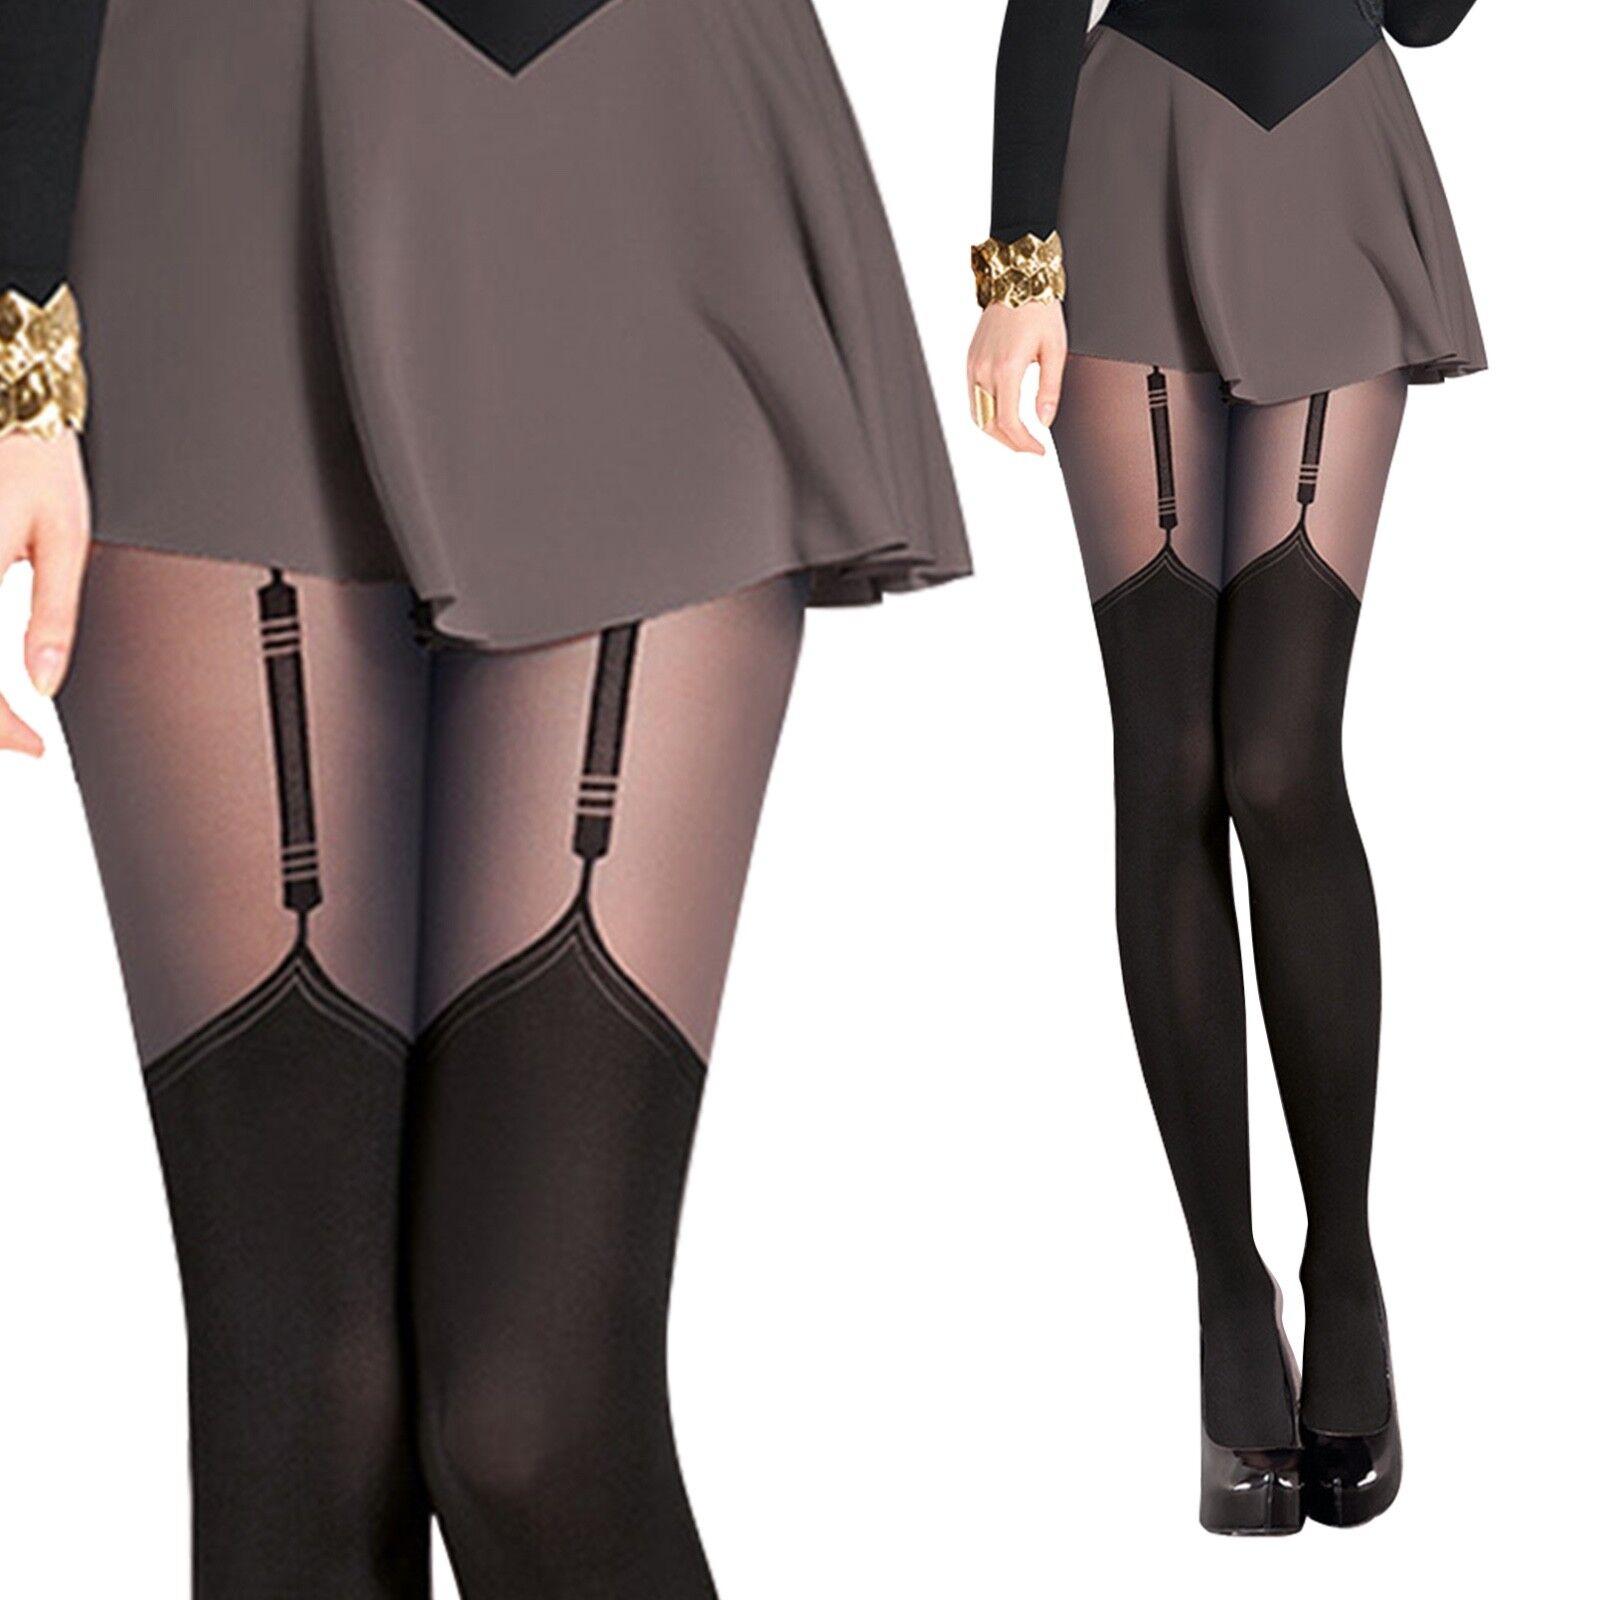 Damen Strumpfhose in Strapsoptik Sexy Muster Overknee Gr. S M L Schwarz 40 DEN